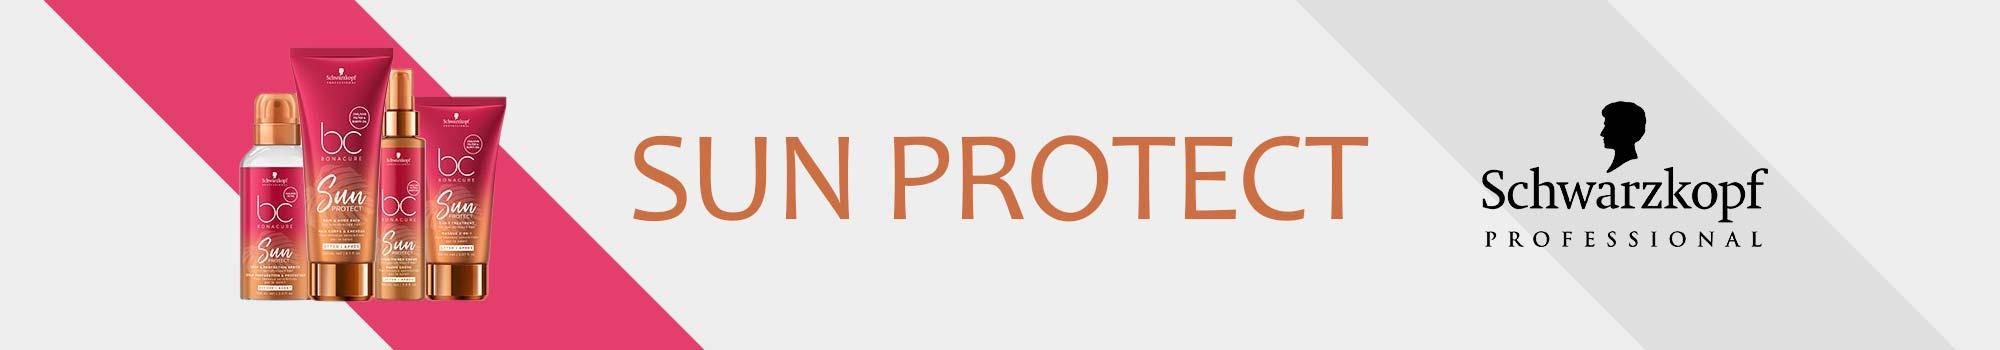 Sun Protect Schwarzkopf Professional